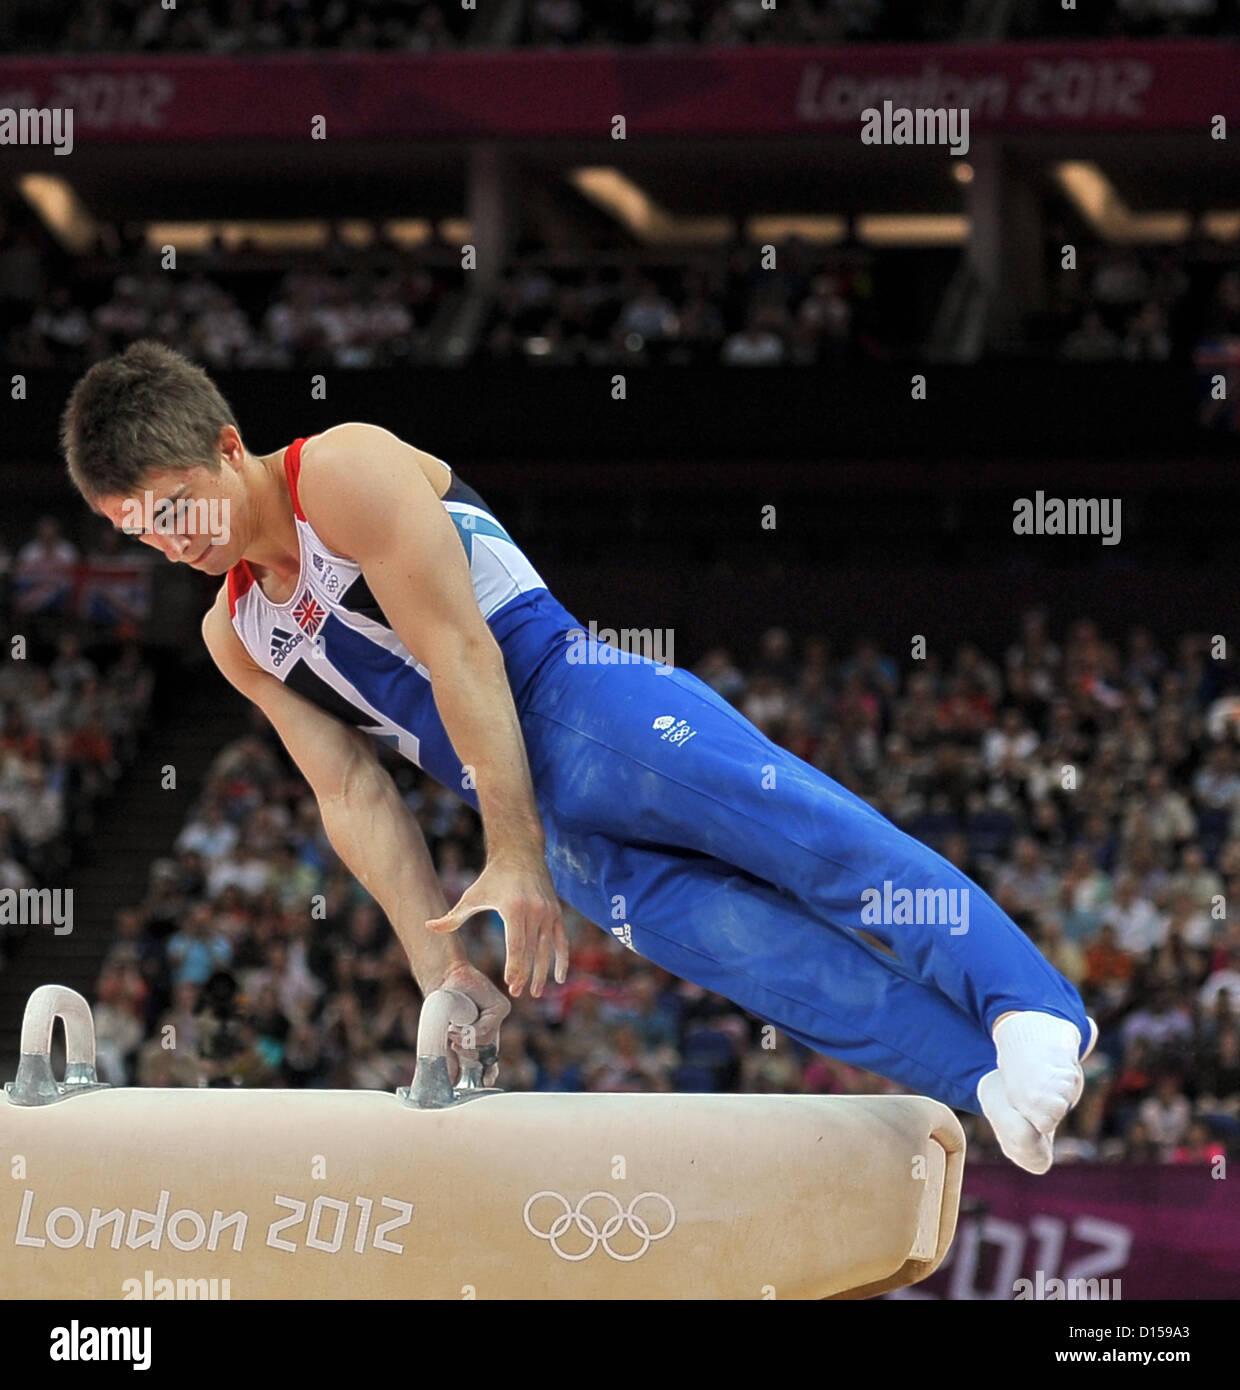 Max Whitlock (GBR, Grande-Bretagne). Gymnastique individuelle Photo Stock